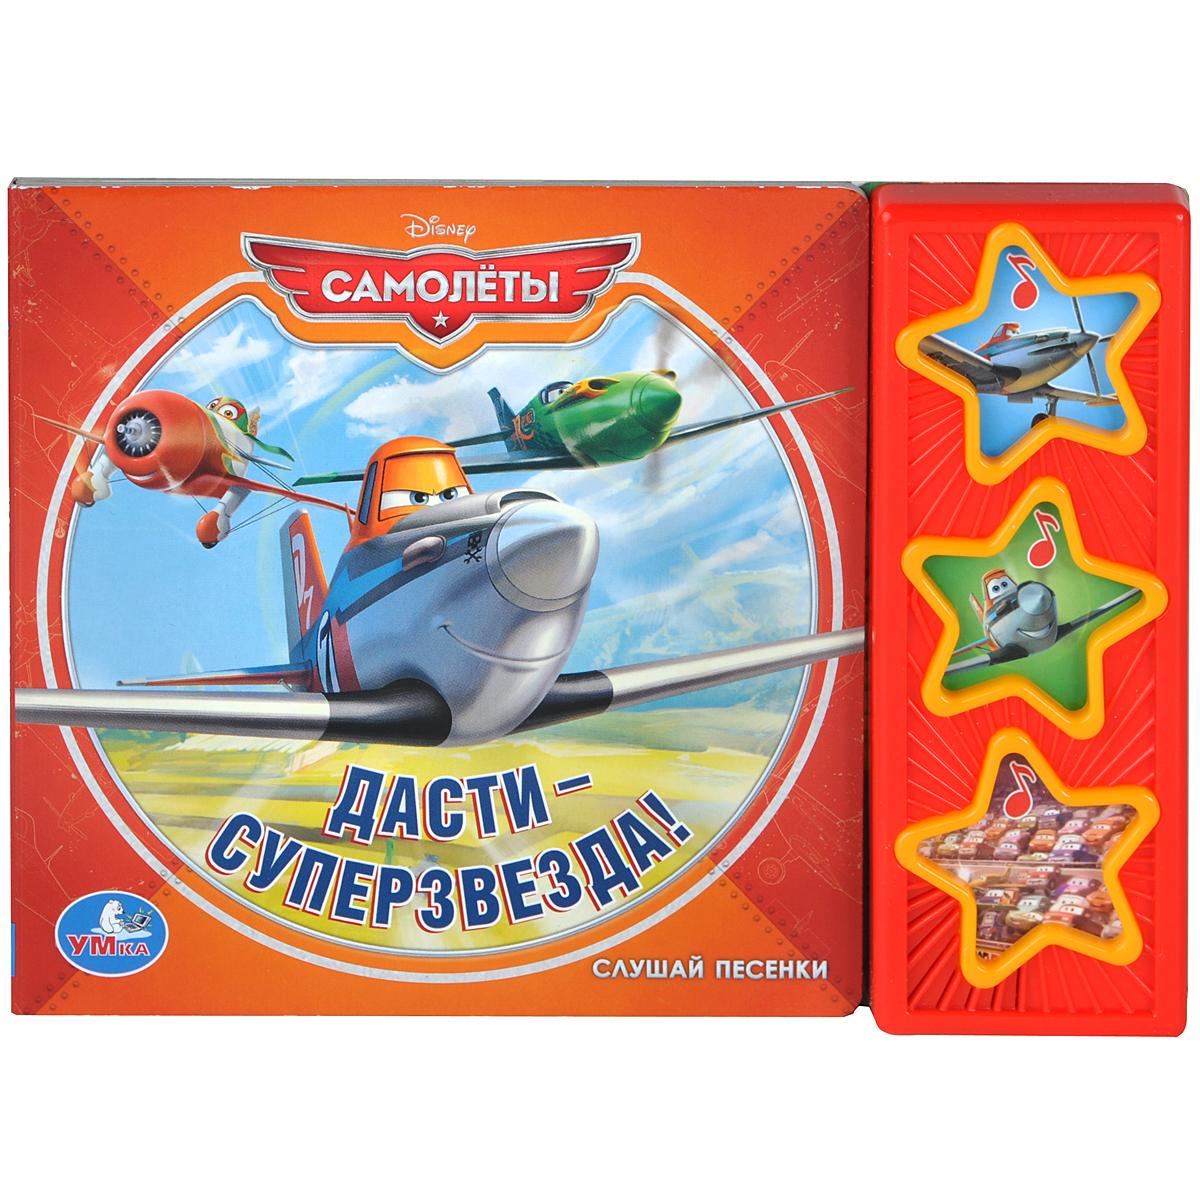 Самолеты. Дасти - суперзвезда. Книжка-игрушка